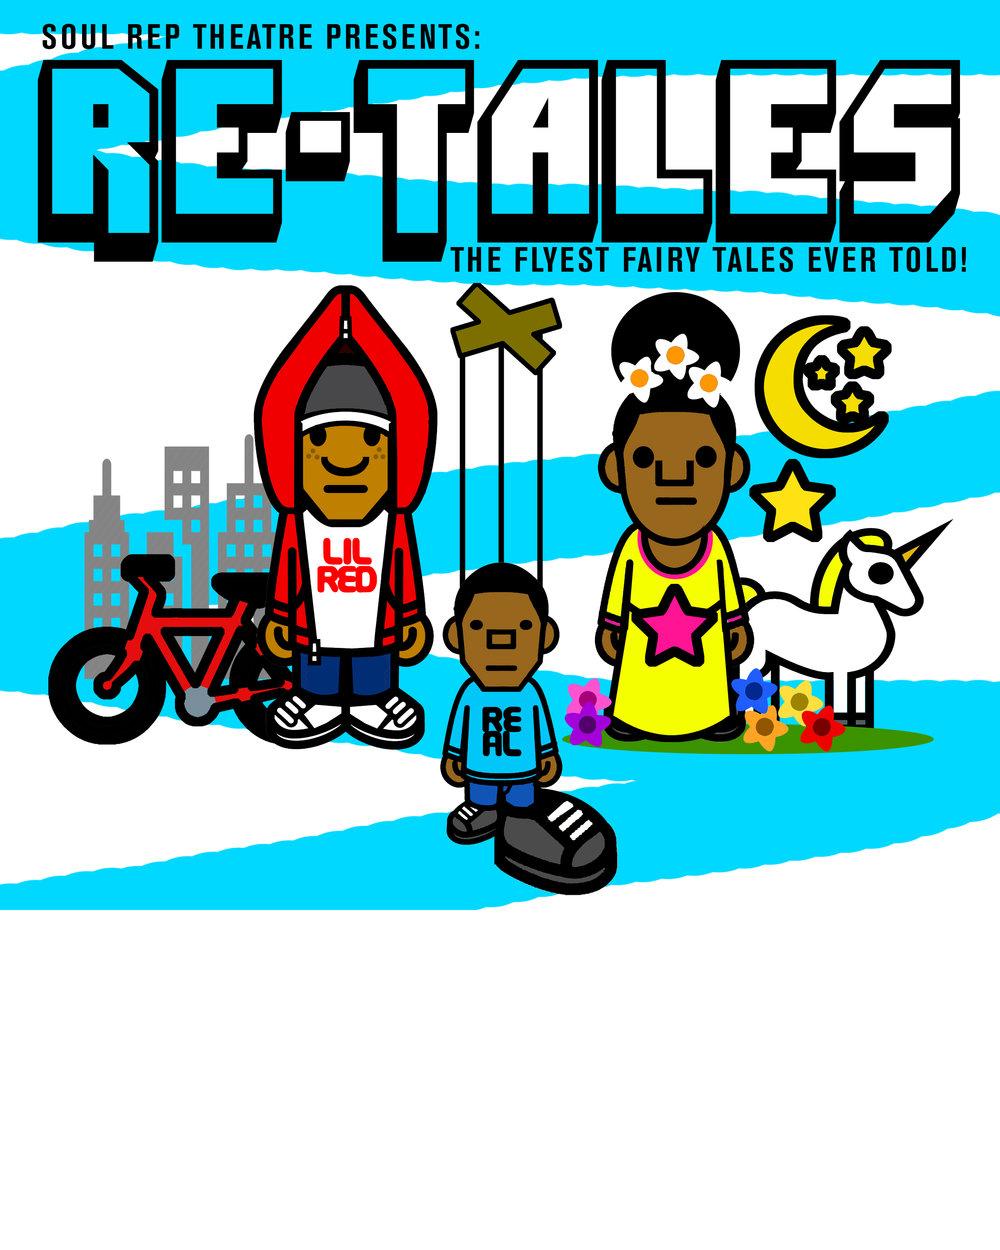 RETALESwebsite.jpg